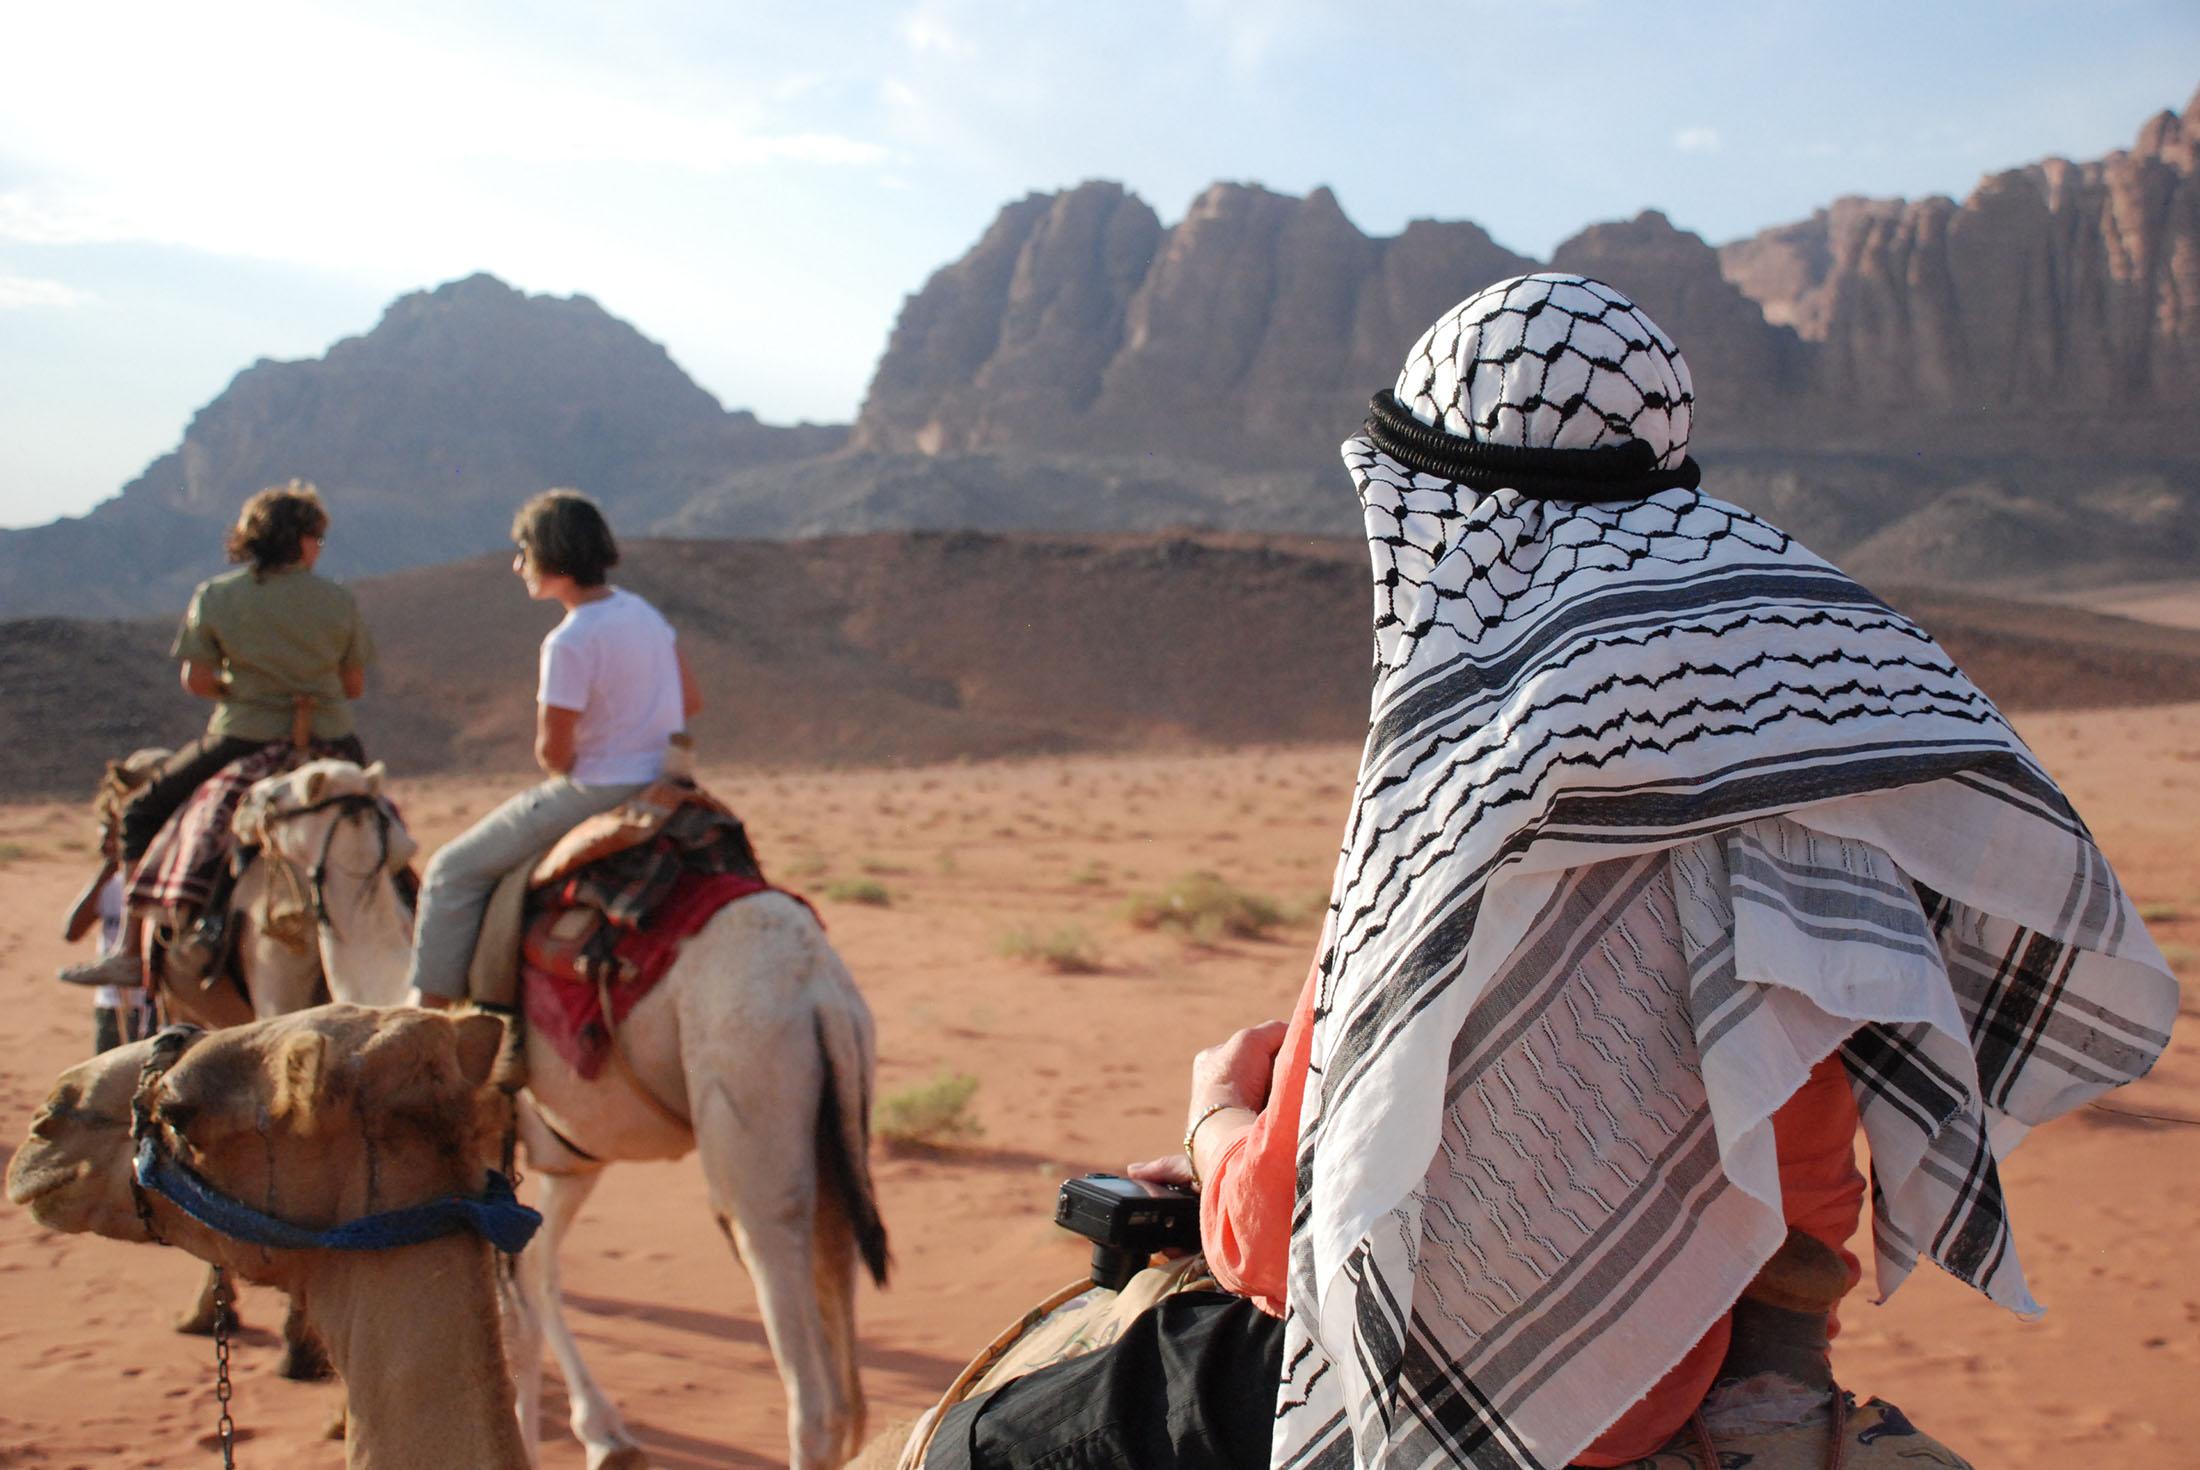 Wadi Rum Experience - Independent 4